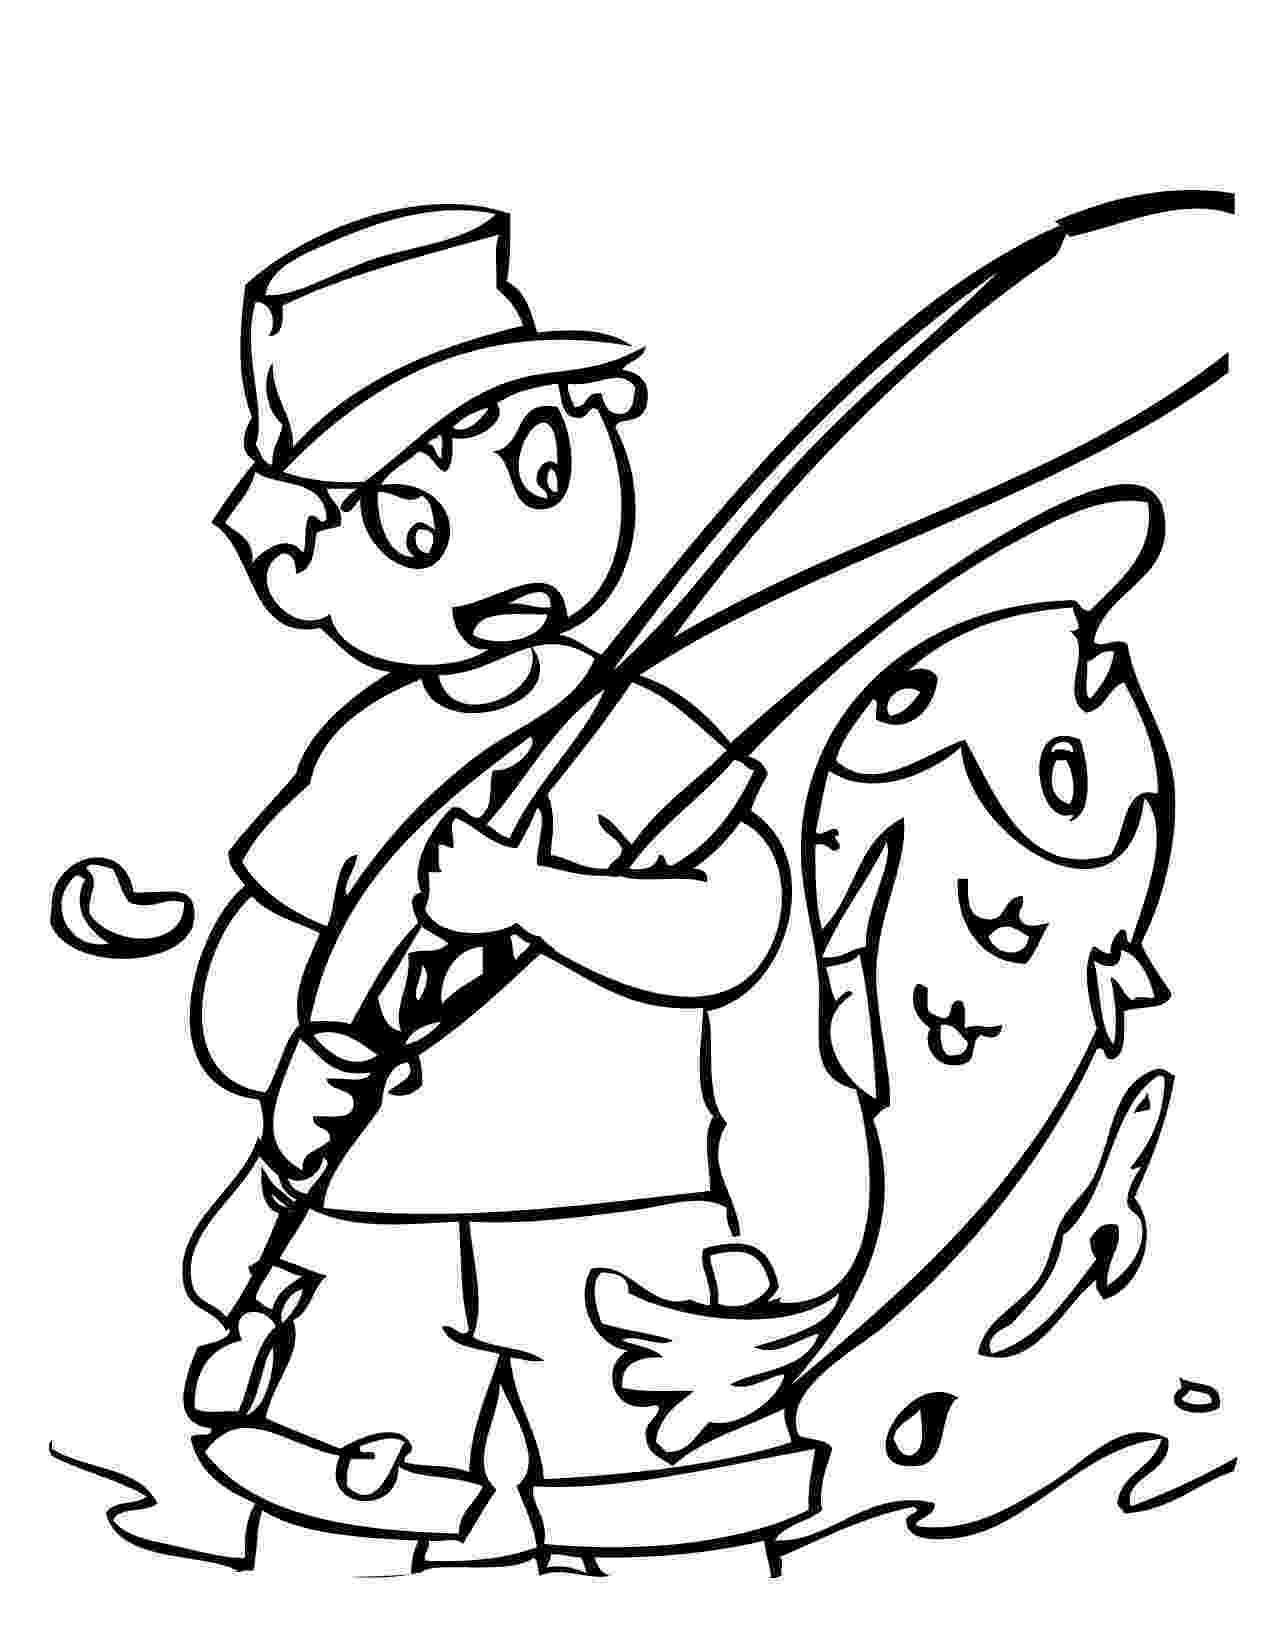 fishing coloring pages printable fishing coloring pages best coloring pages for kids printable pages coloring fishing